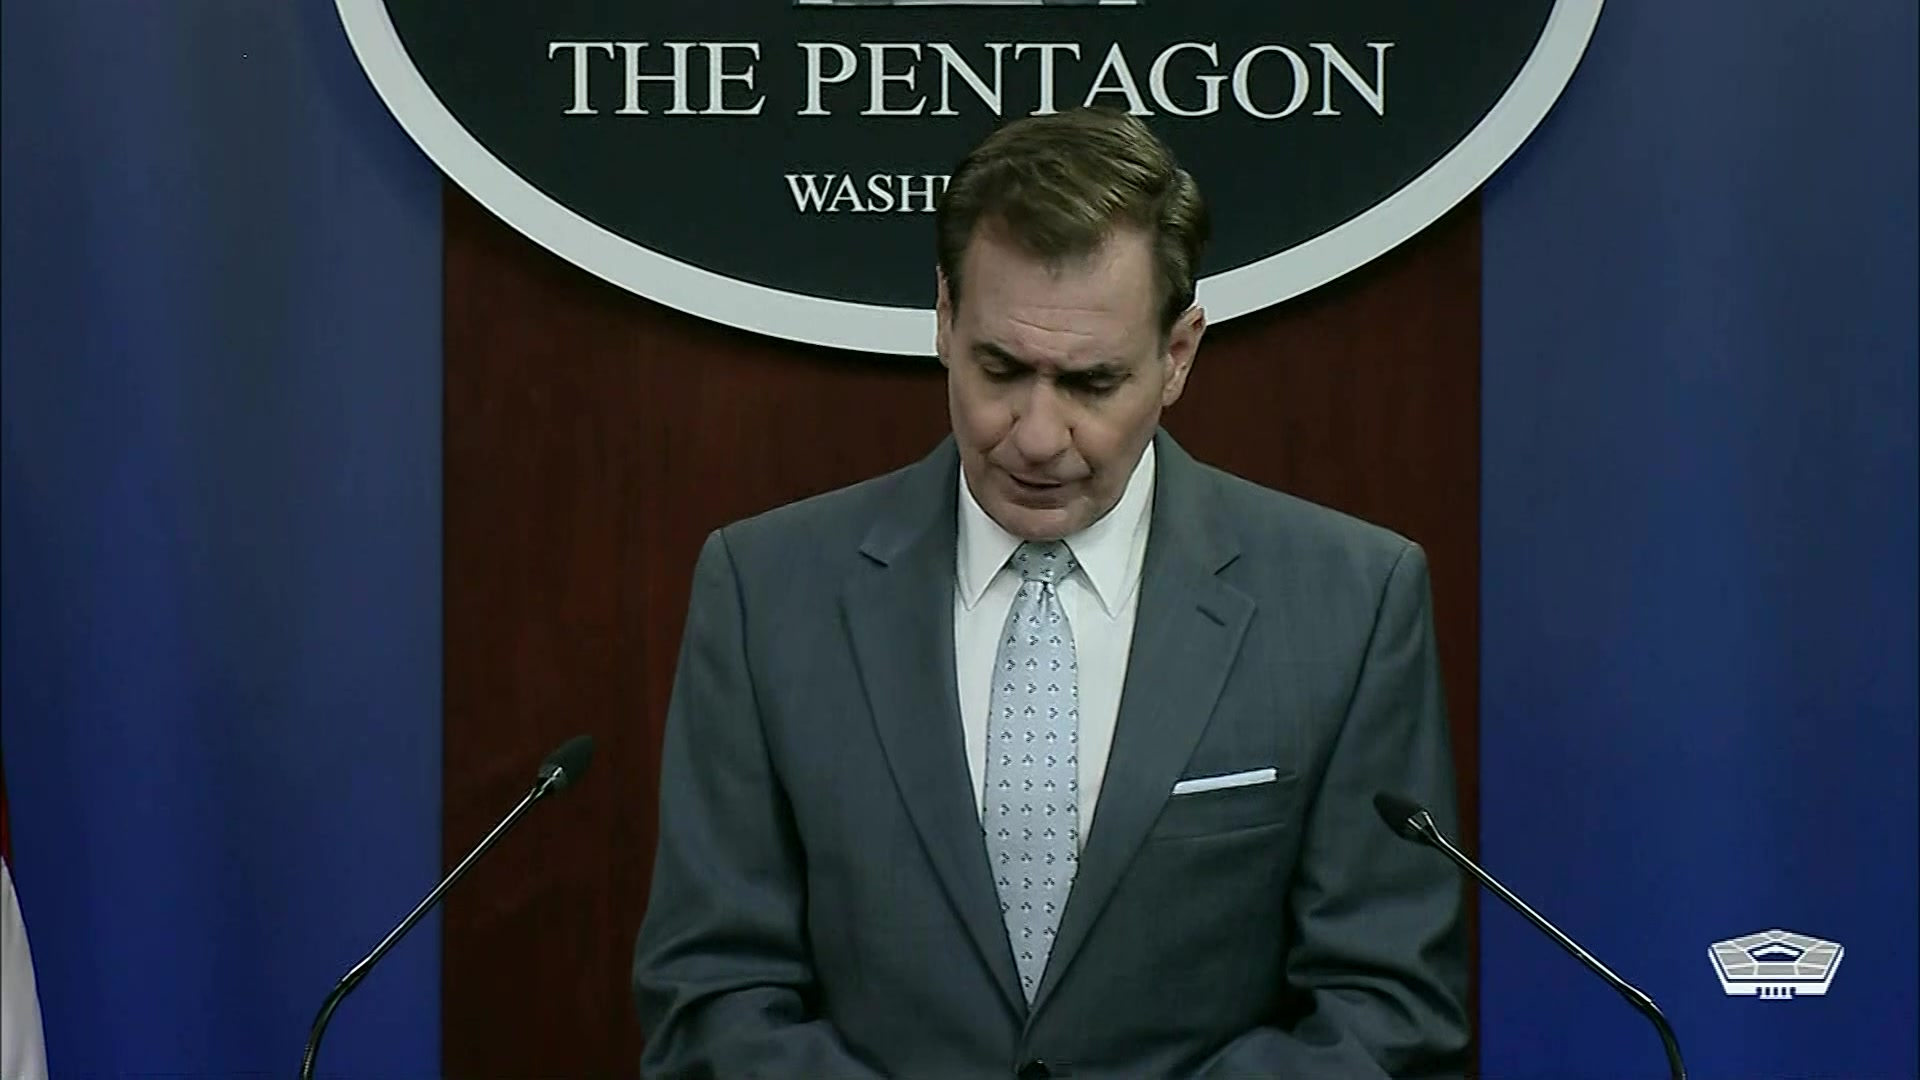 Pentagon Press Secretary John F. Kirby and Air Force Gen. Glen D. VanHerck, commander of North American Aerospace Defense Command and U.S. Northern Command, brief the media at the Pentagon.